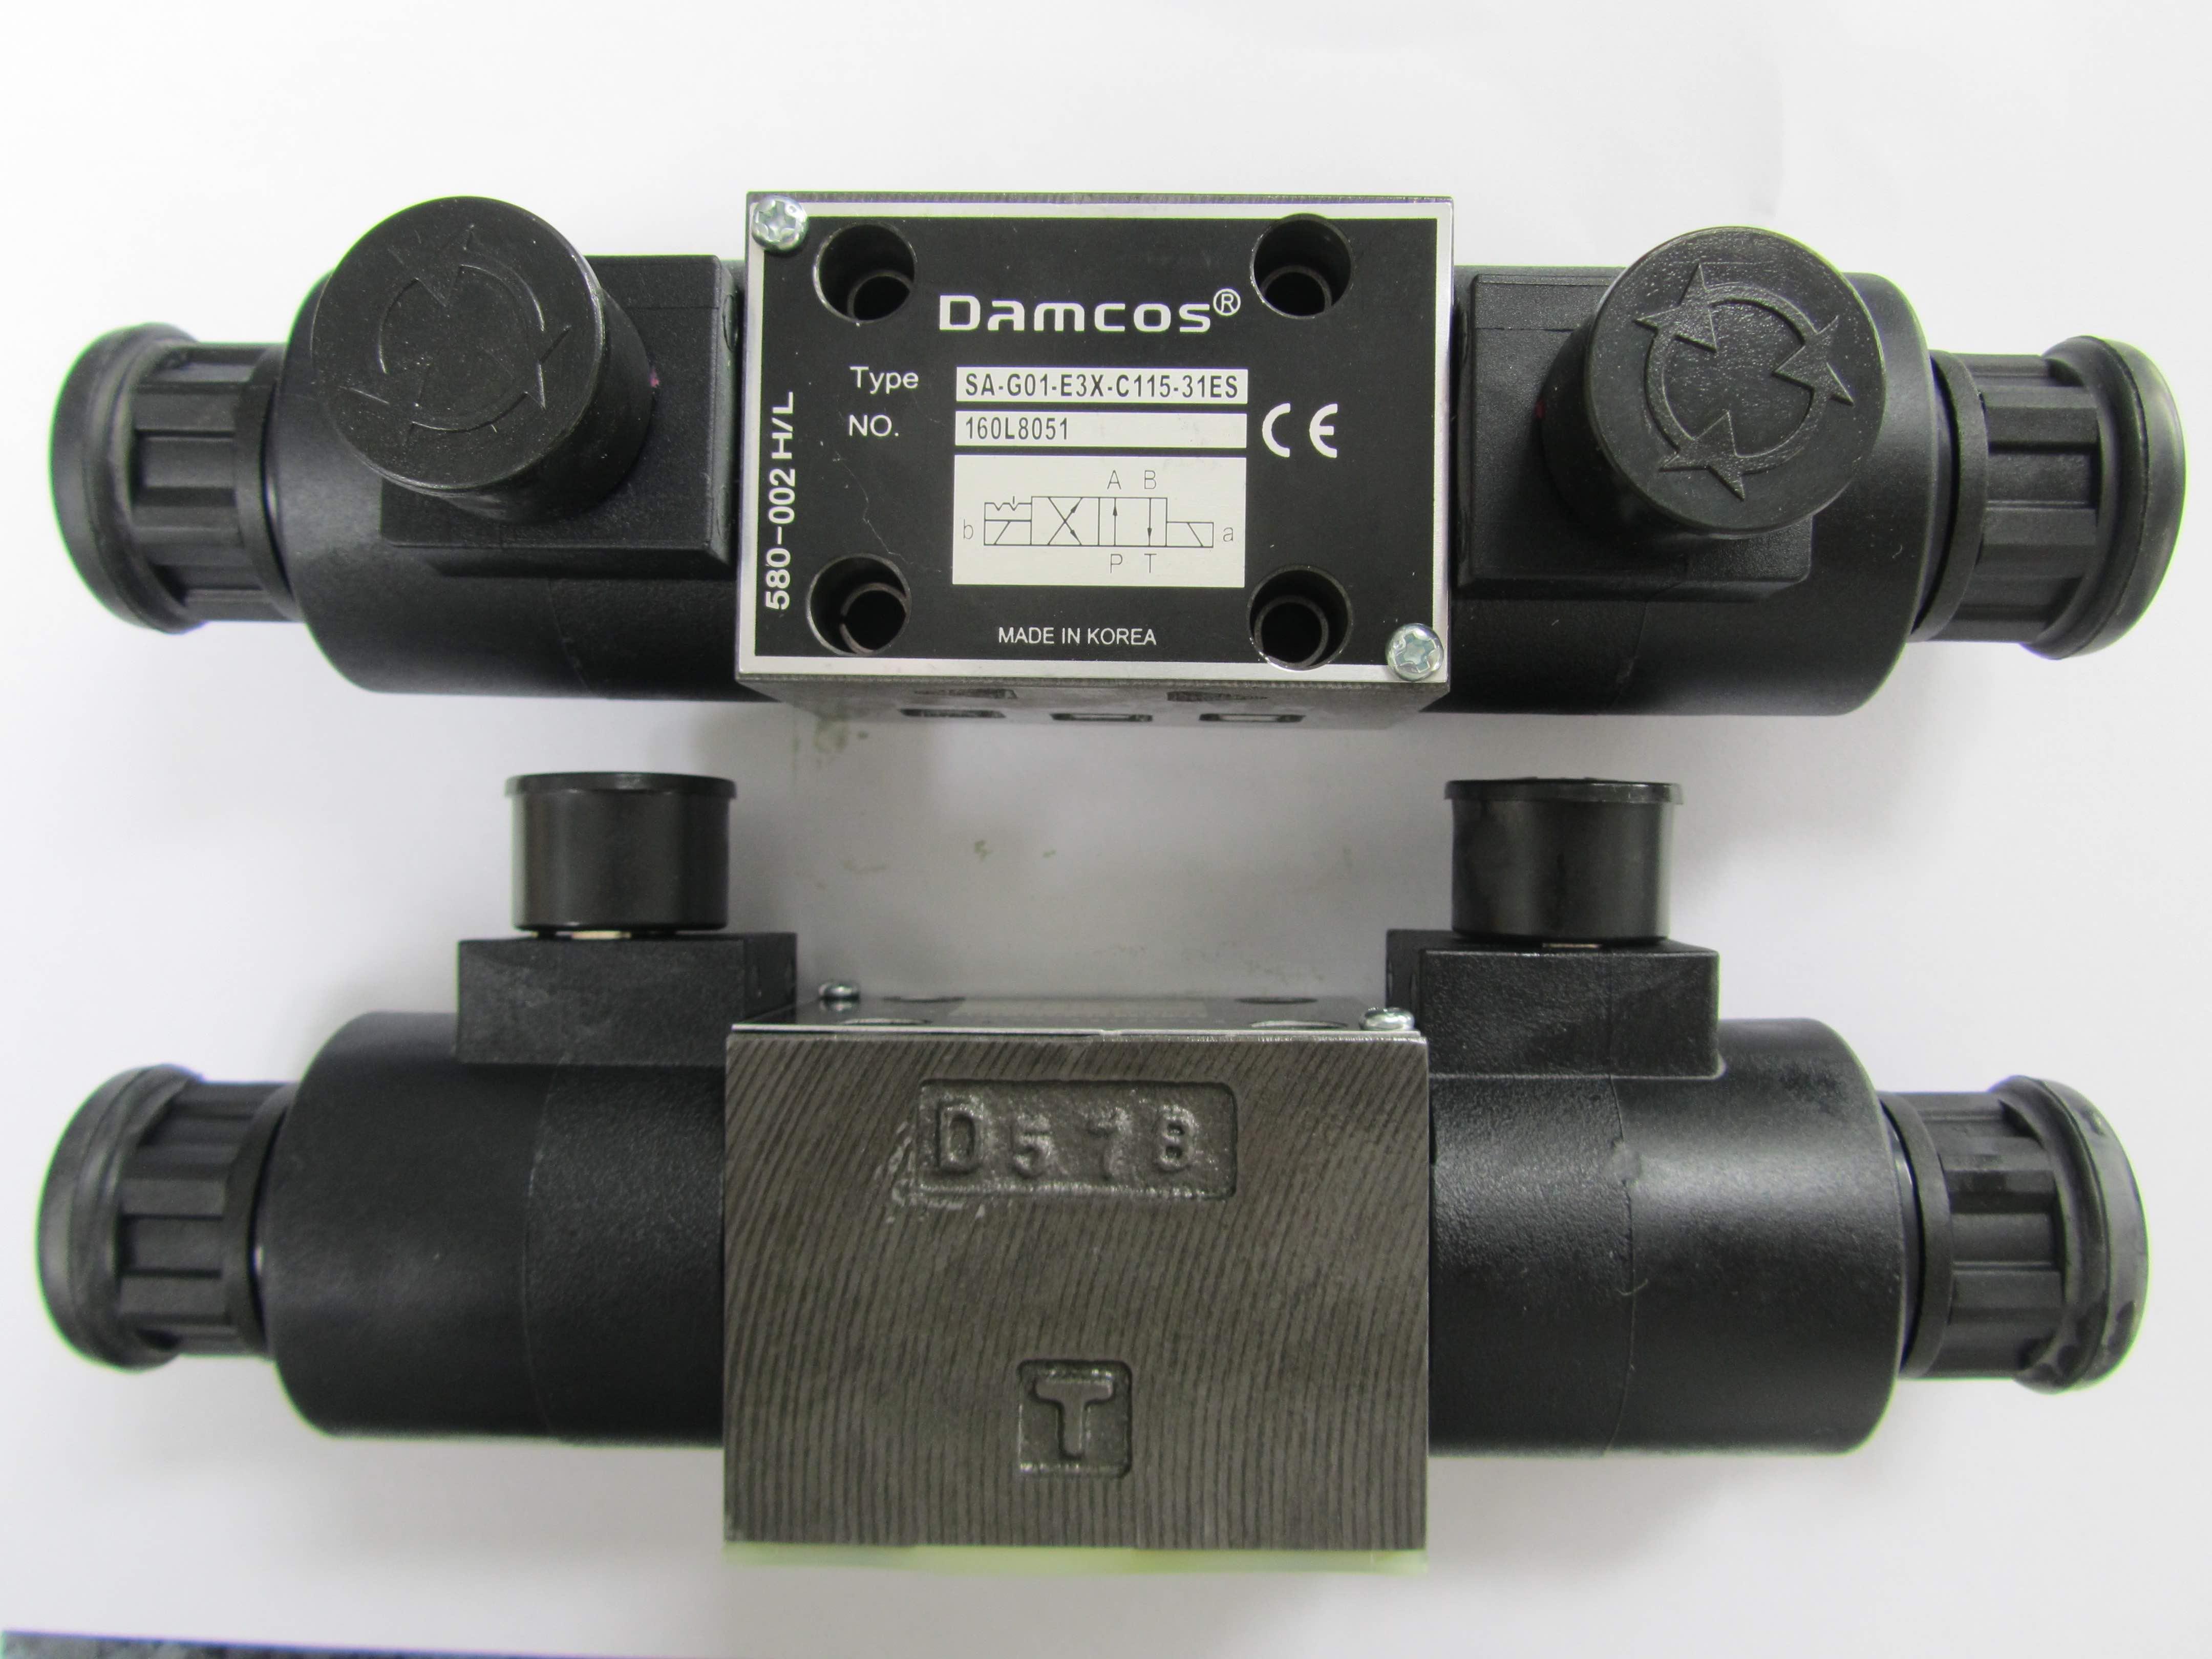 Damcos 160L8051